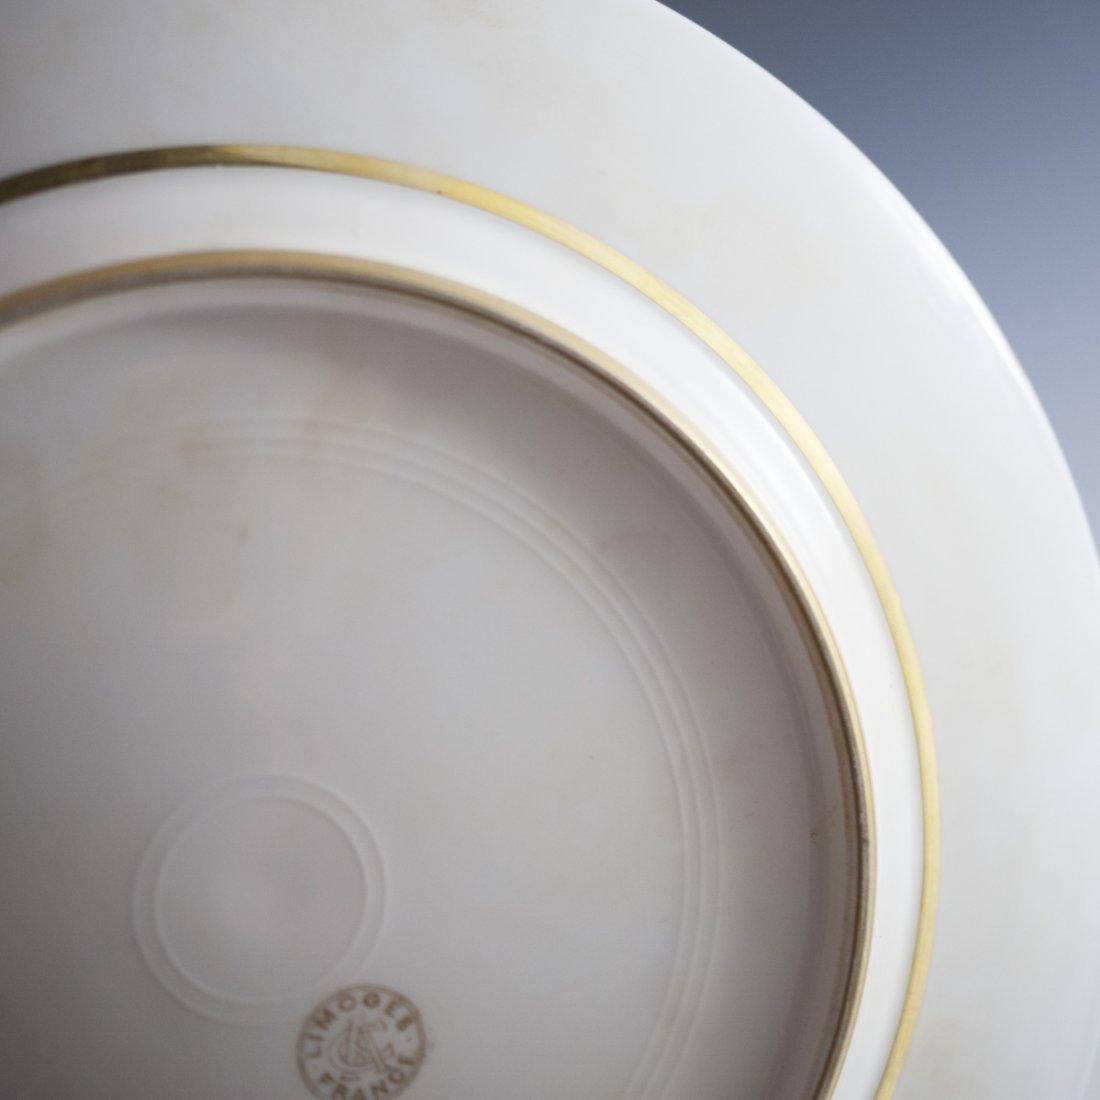 Charles Ahrenfeldt Limoges Cobalt Plates - 4